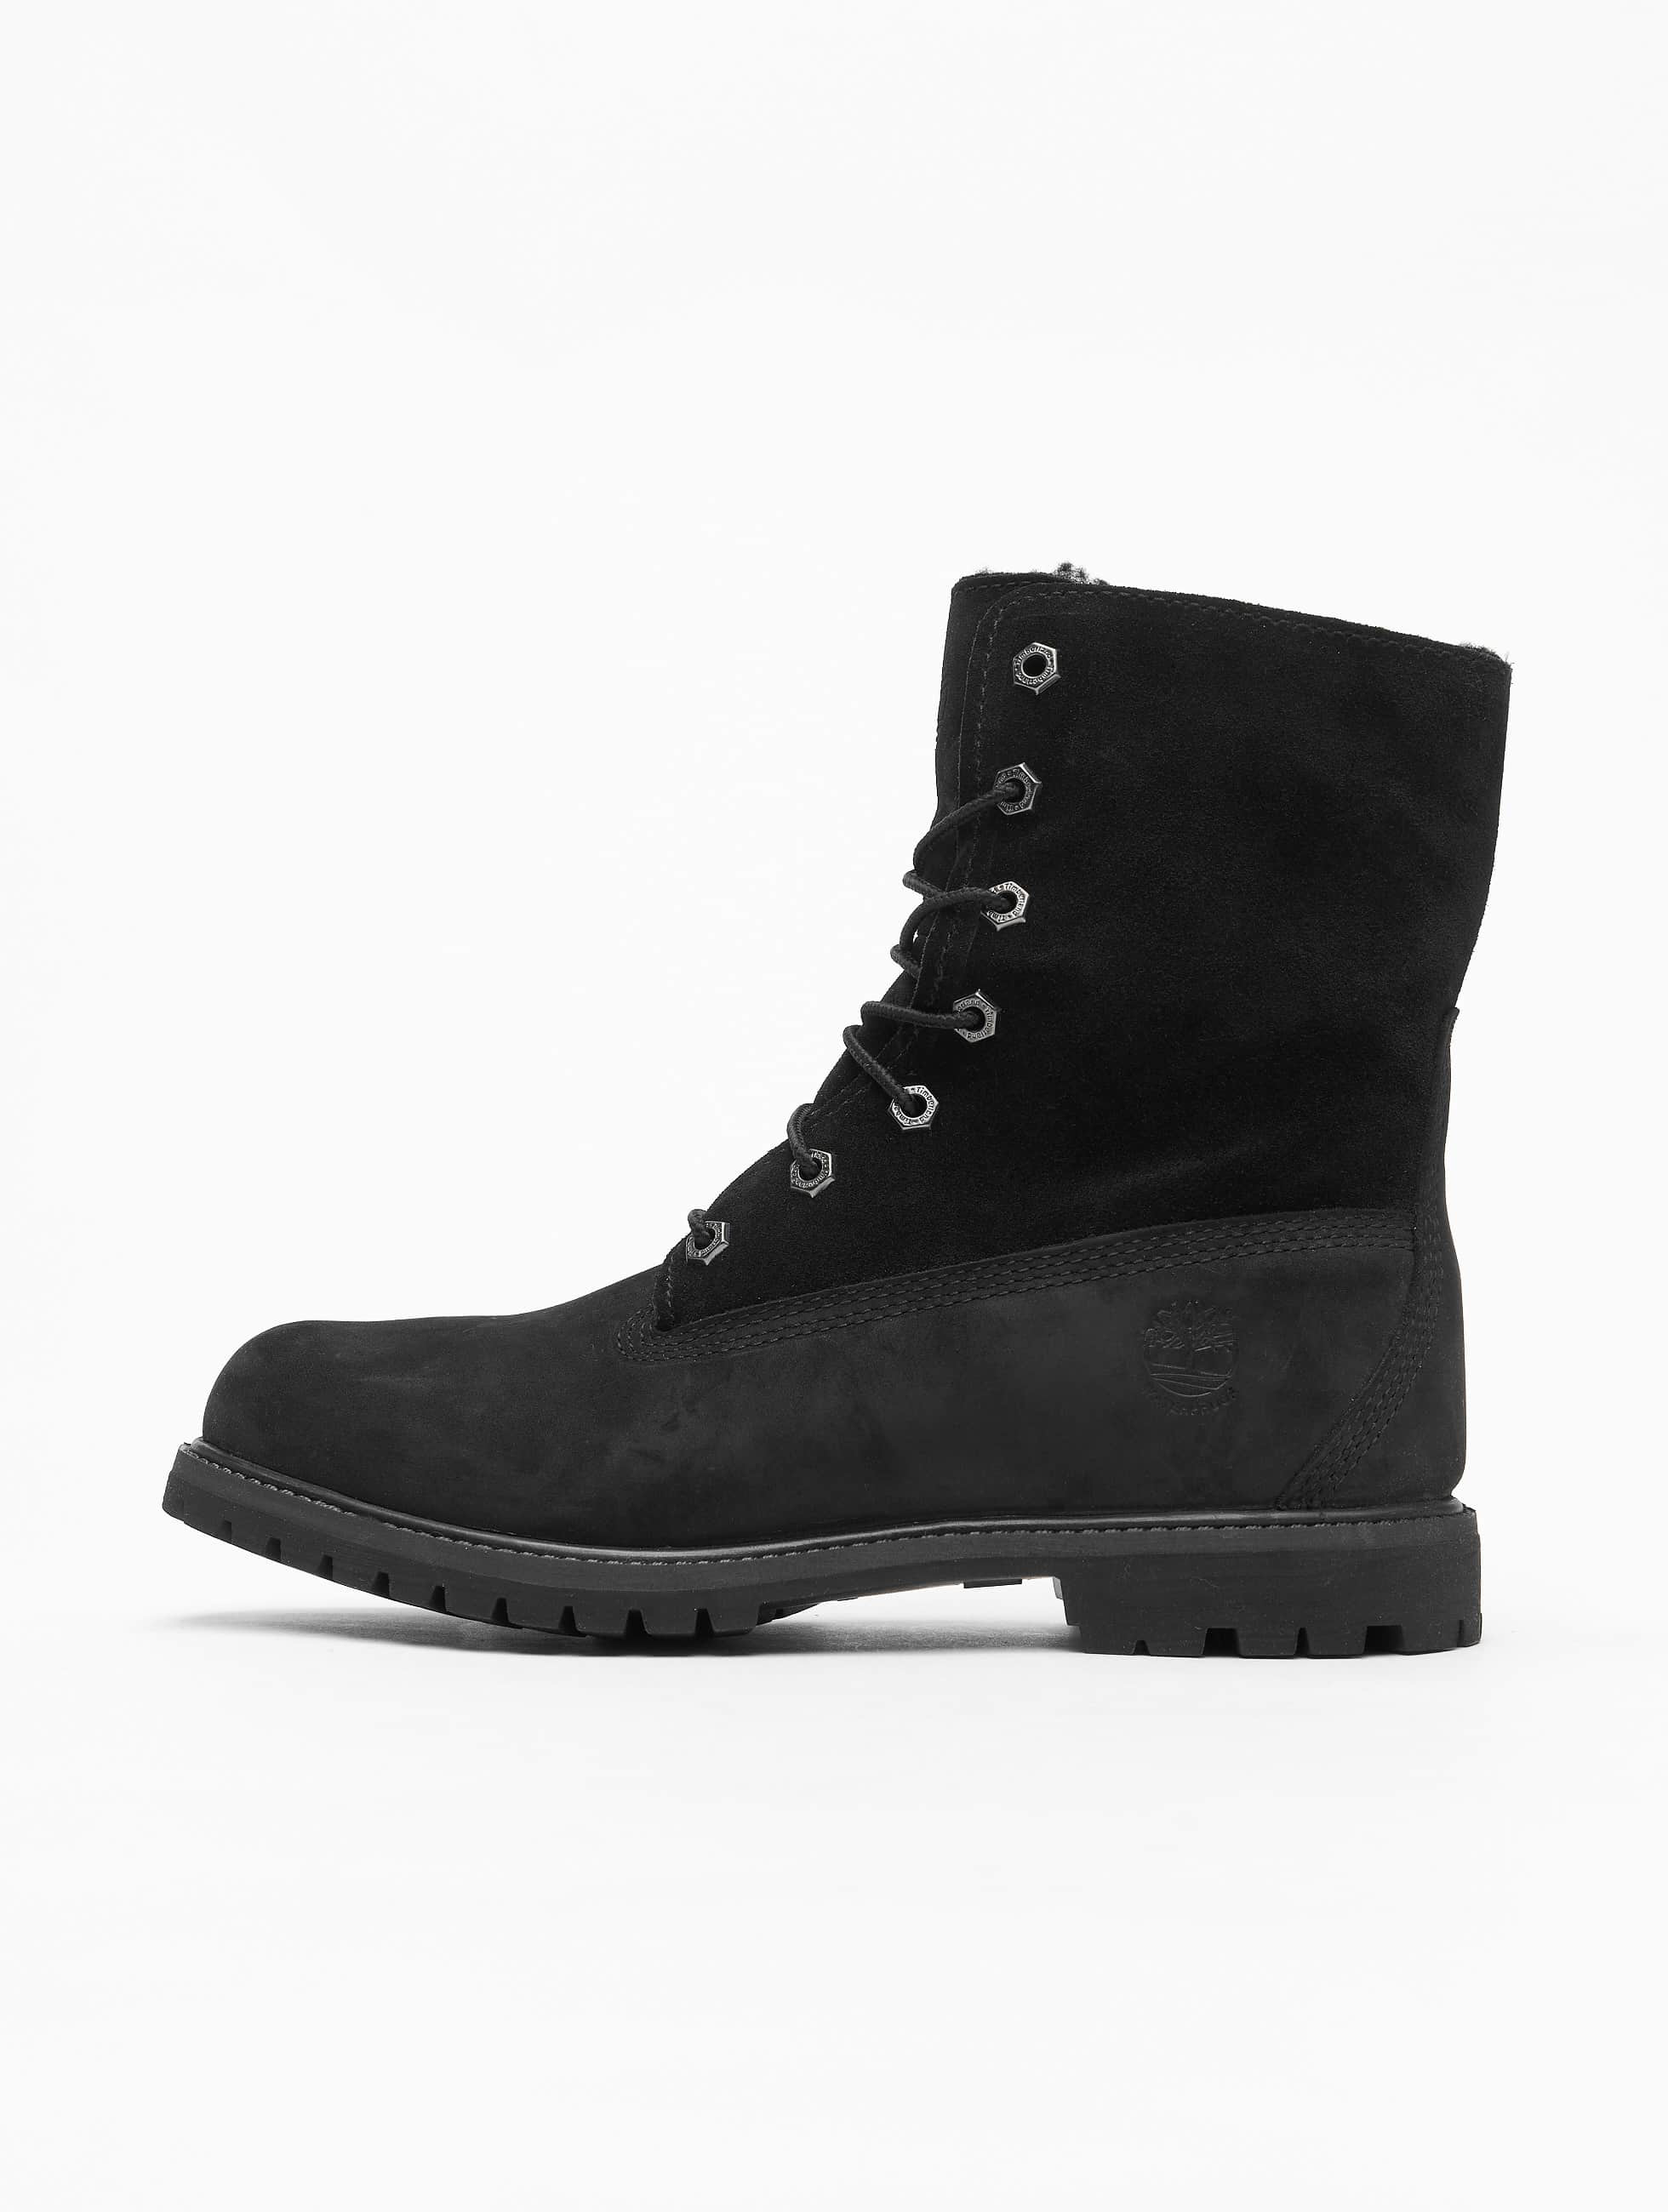 timberland damen schuhe boots authentics waterproof ebay. Black Bedroom Furniture Sets. Home Design Ideas